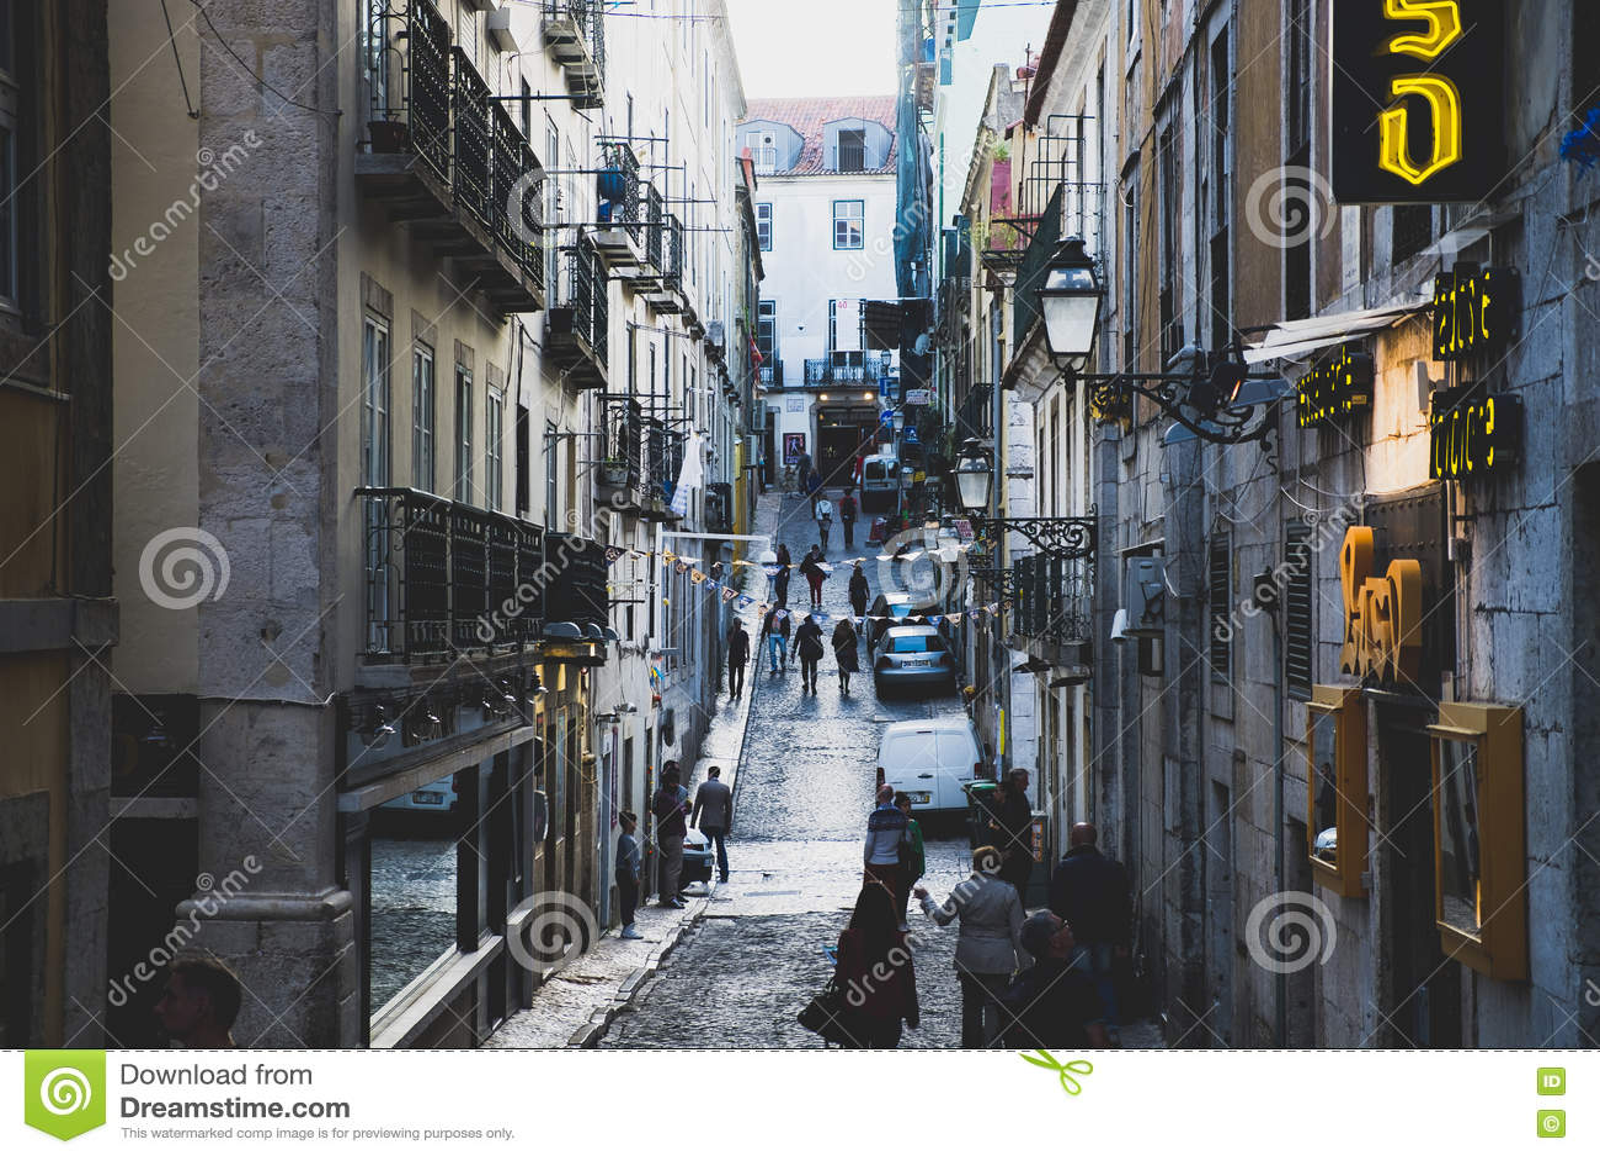 Street scene in Bairro Alto district in Lisbon